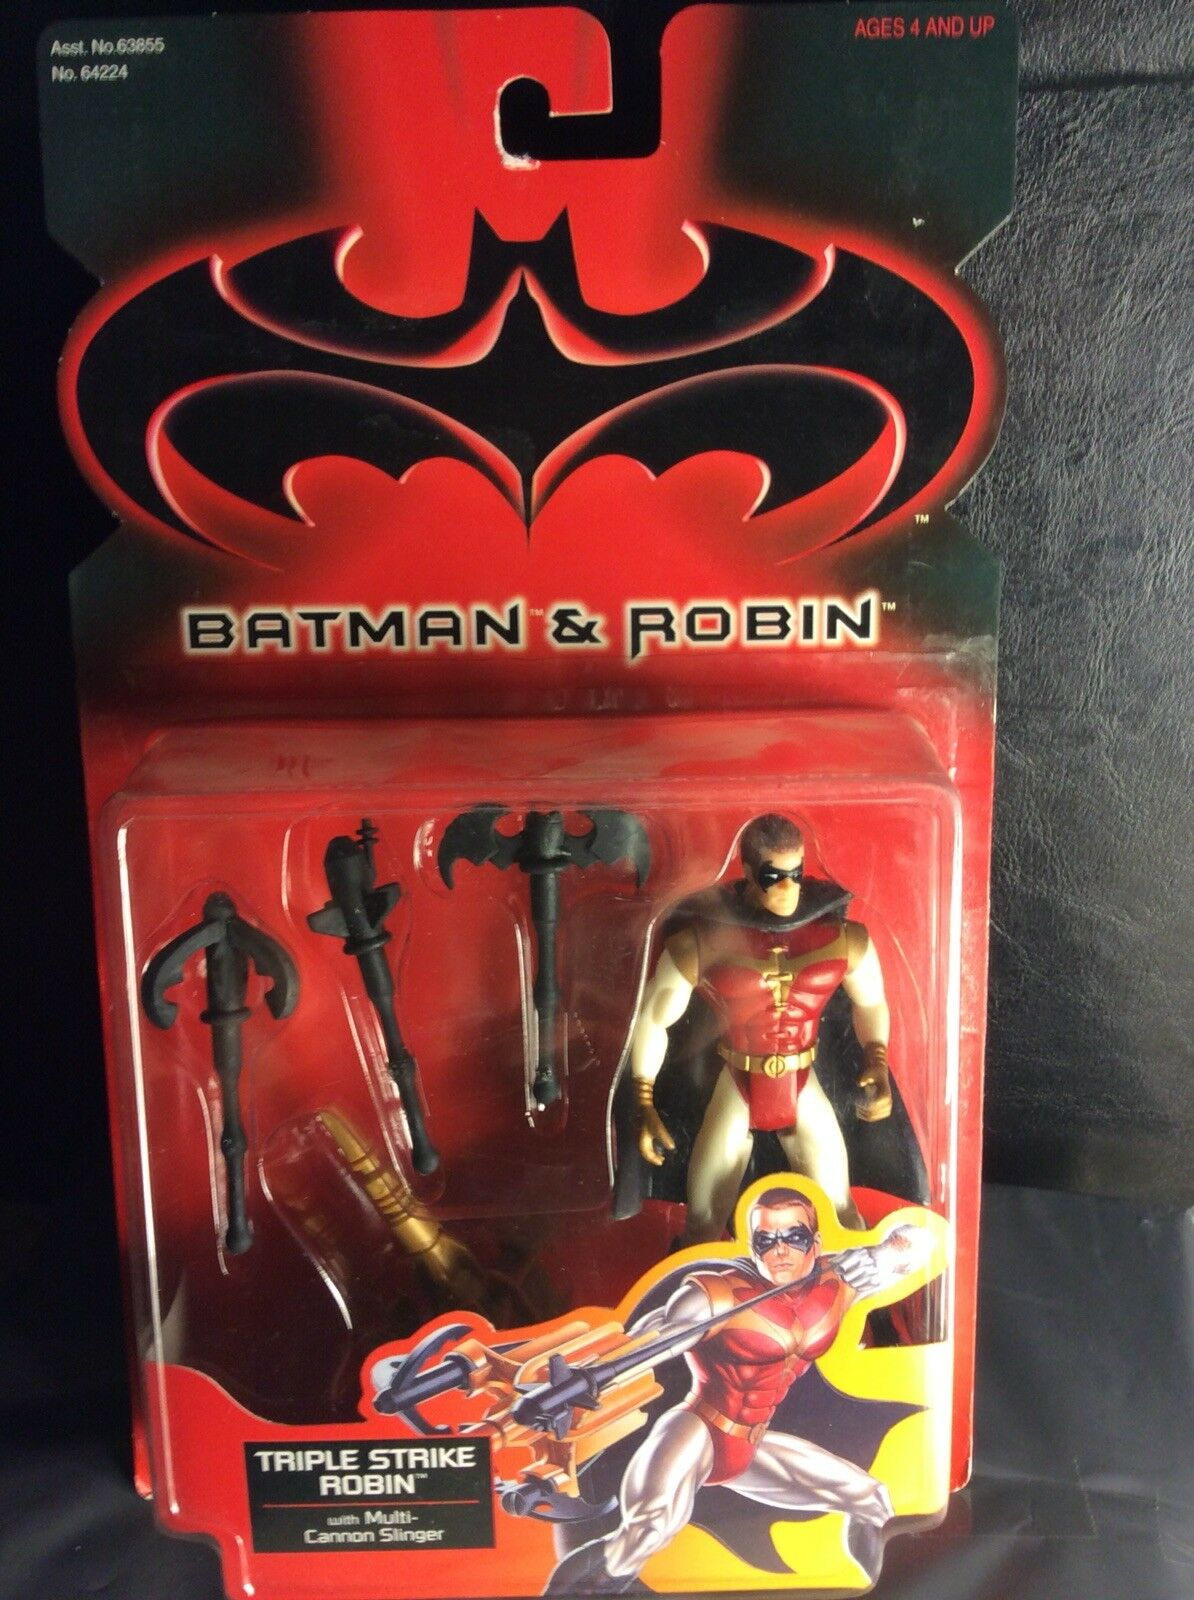 1997 Kenner Batman e Robin Triple Strike Robin